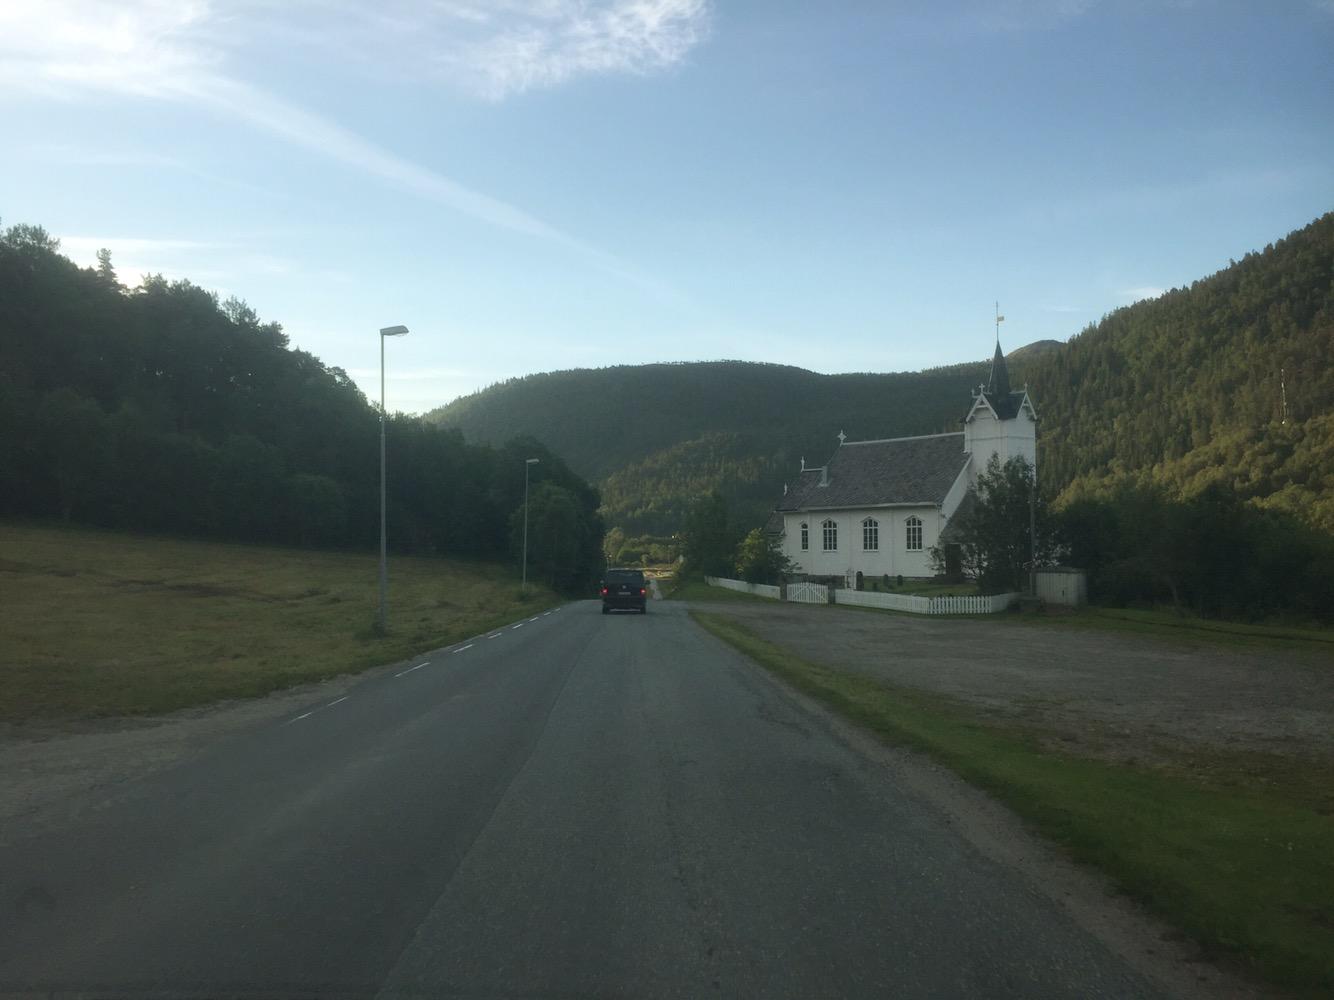 Richtung Oslo morgens um 05:30 Uhr